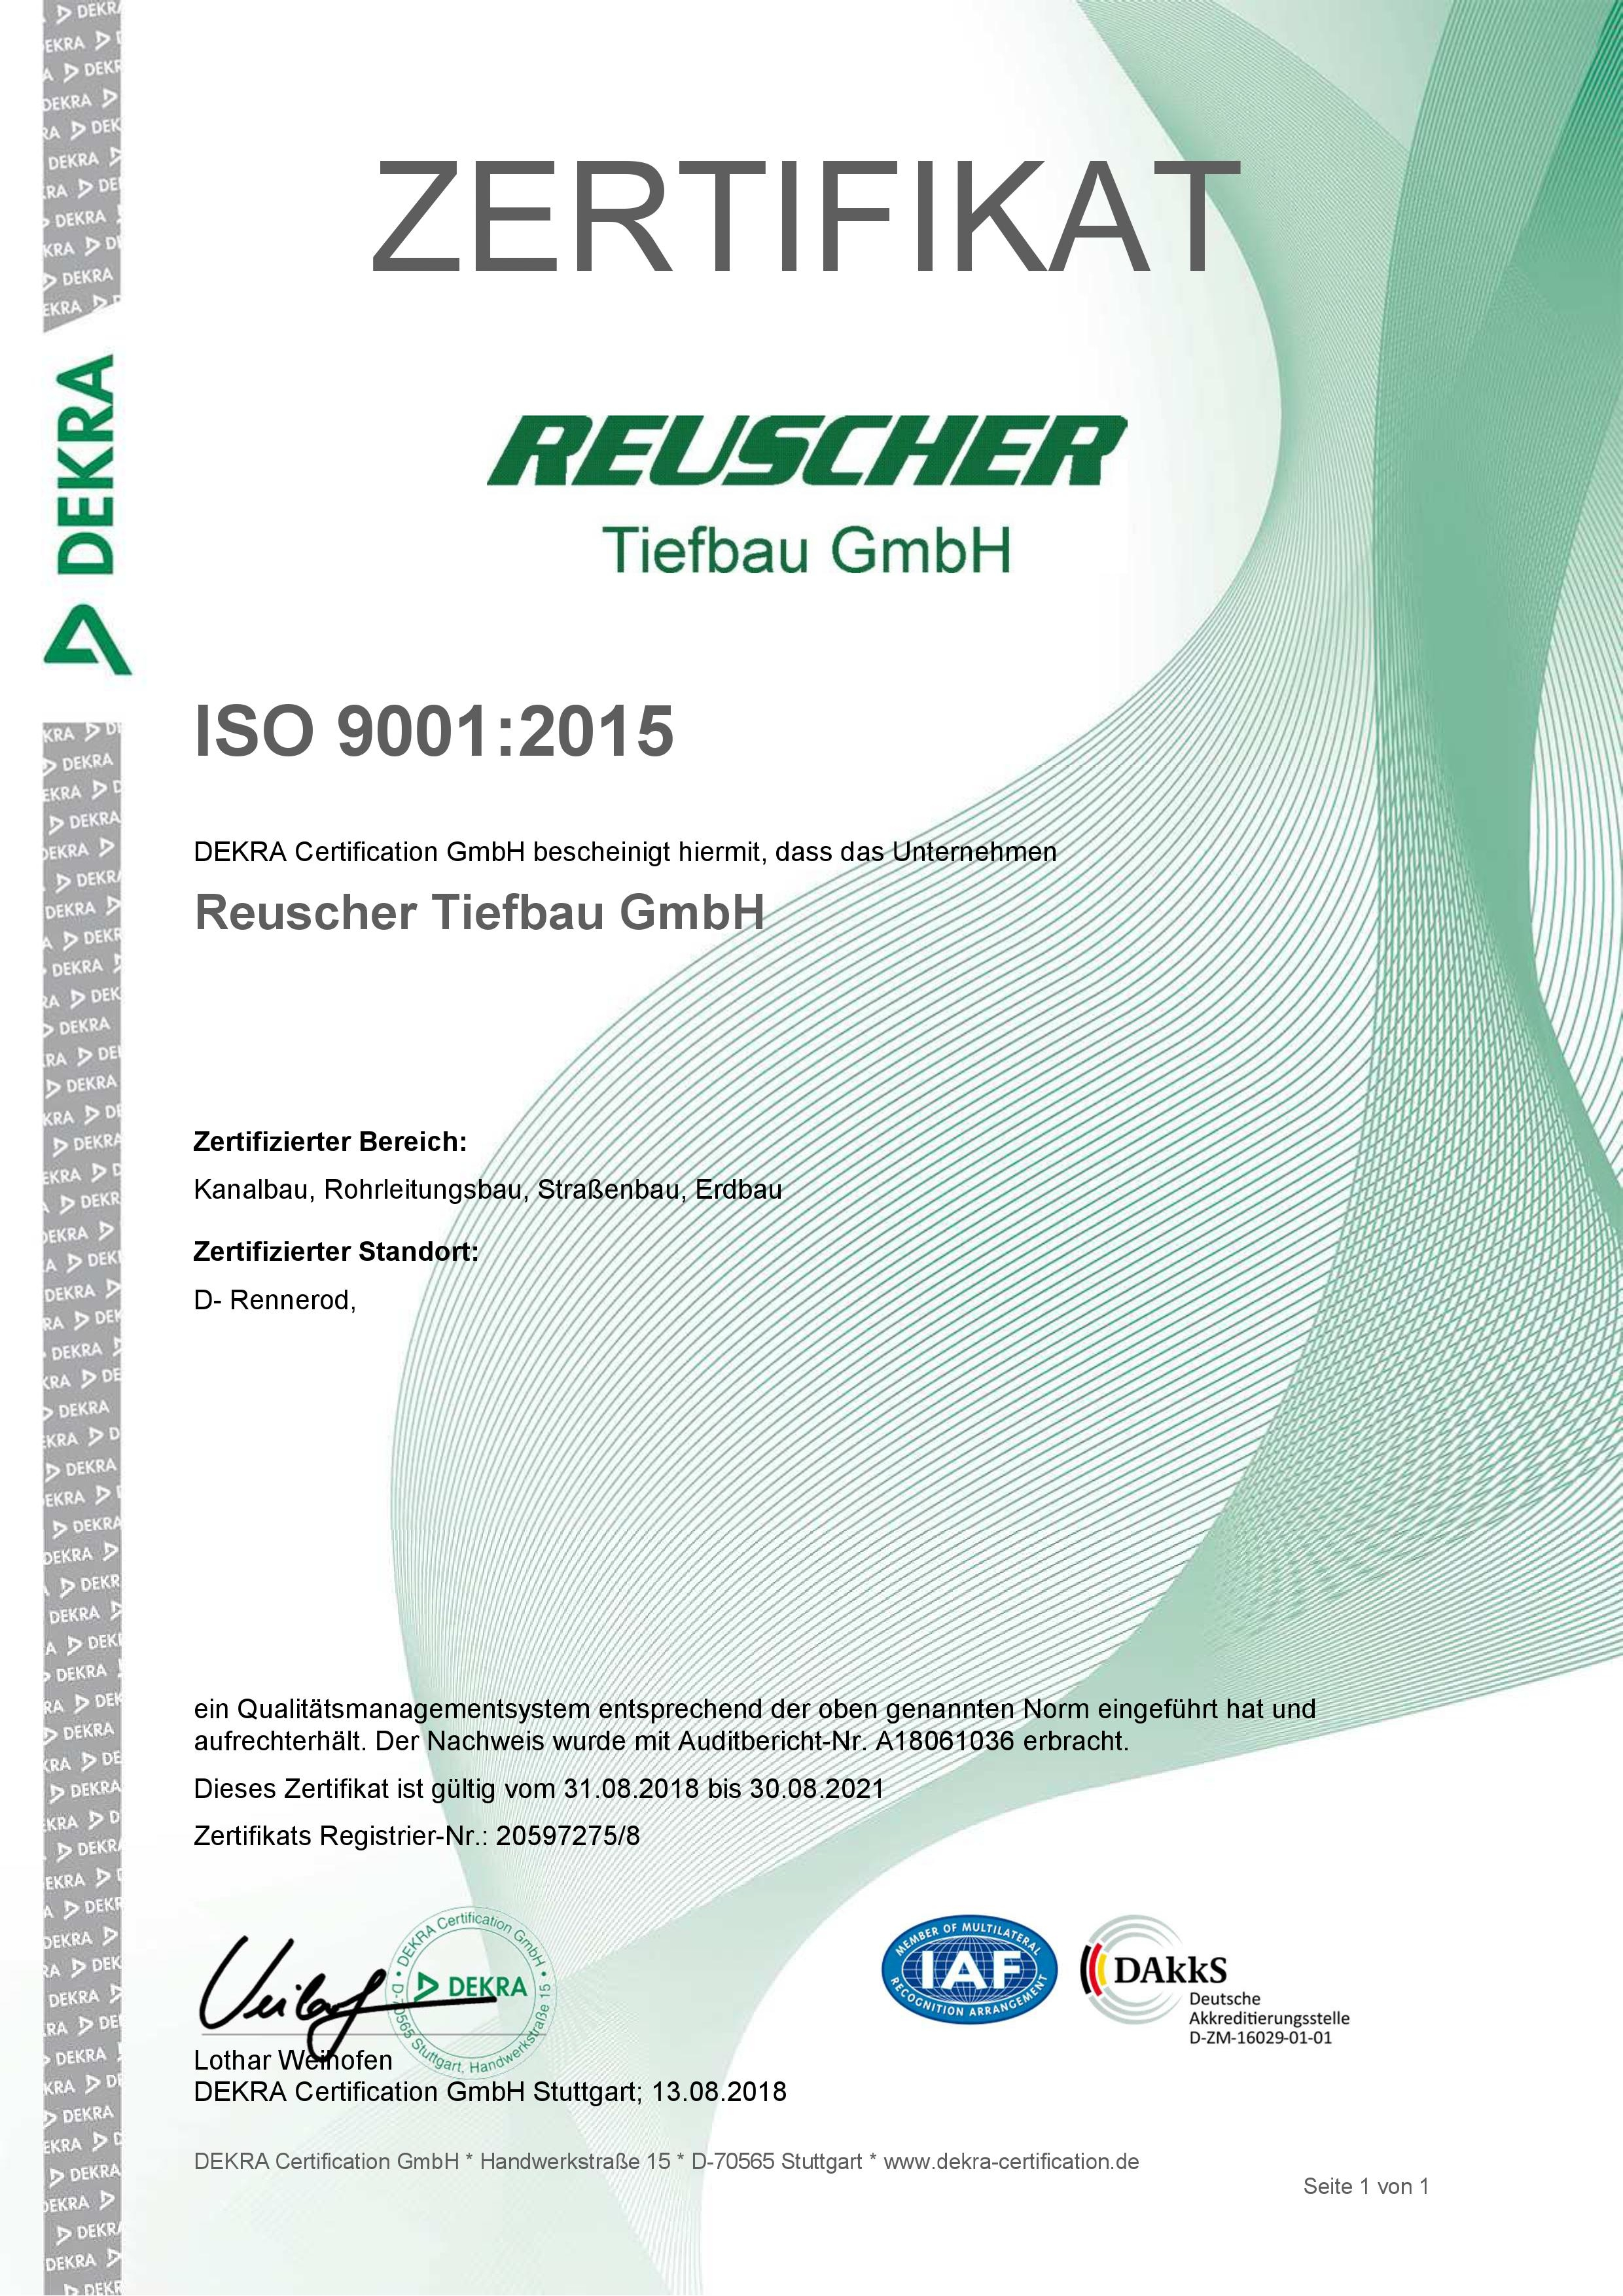 Dekra Zertifikat 2018